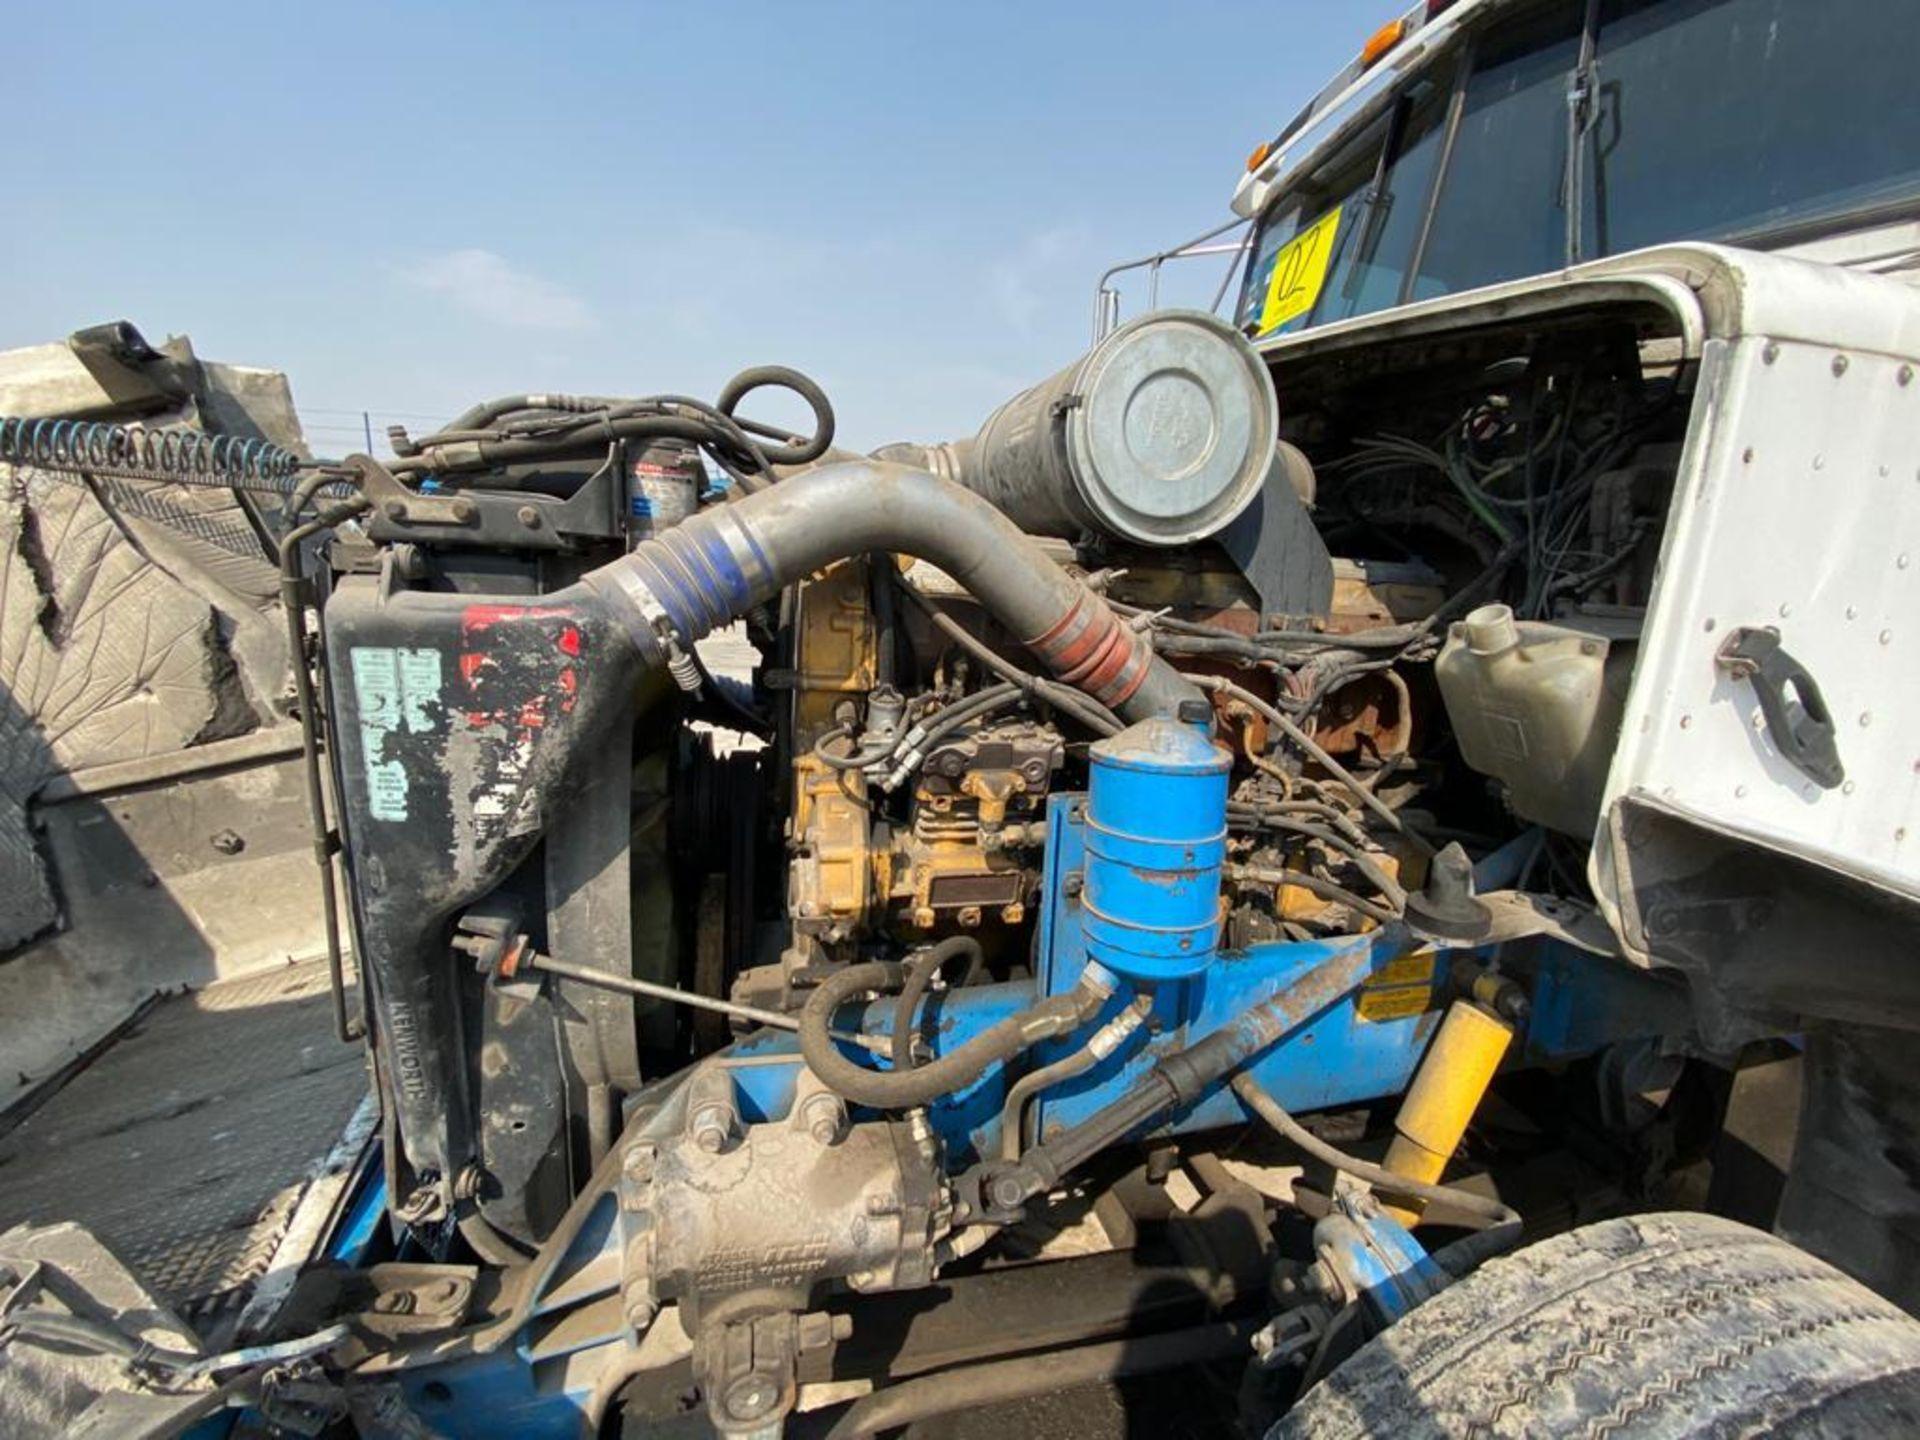 1999 Kenworth Sleeper truck tractor, standard transmission of 18 speeds - Image 69 of 75